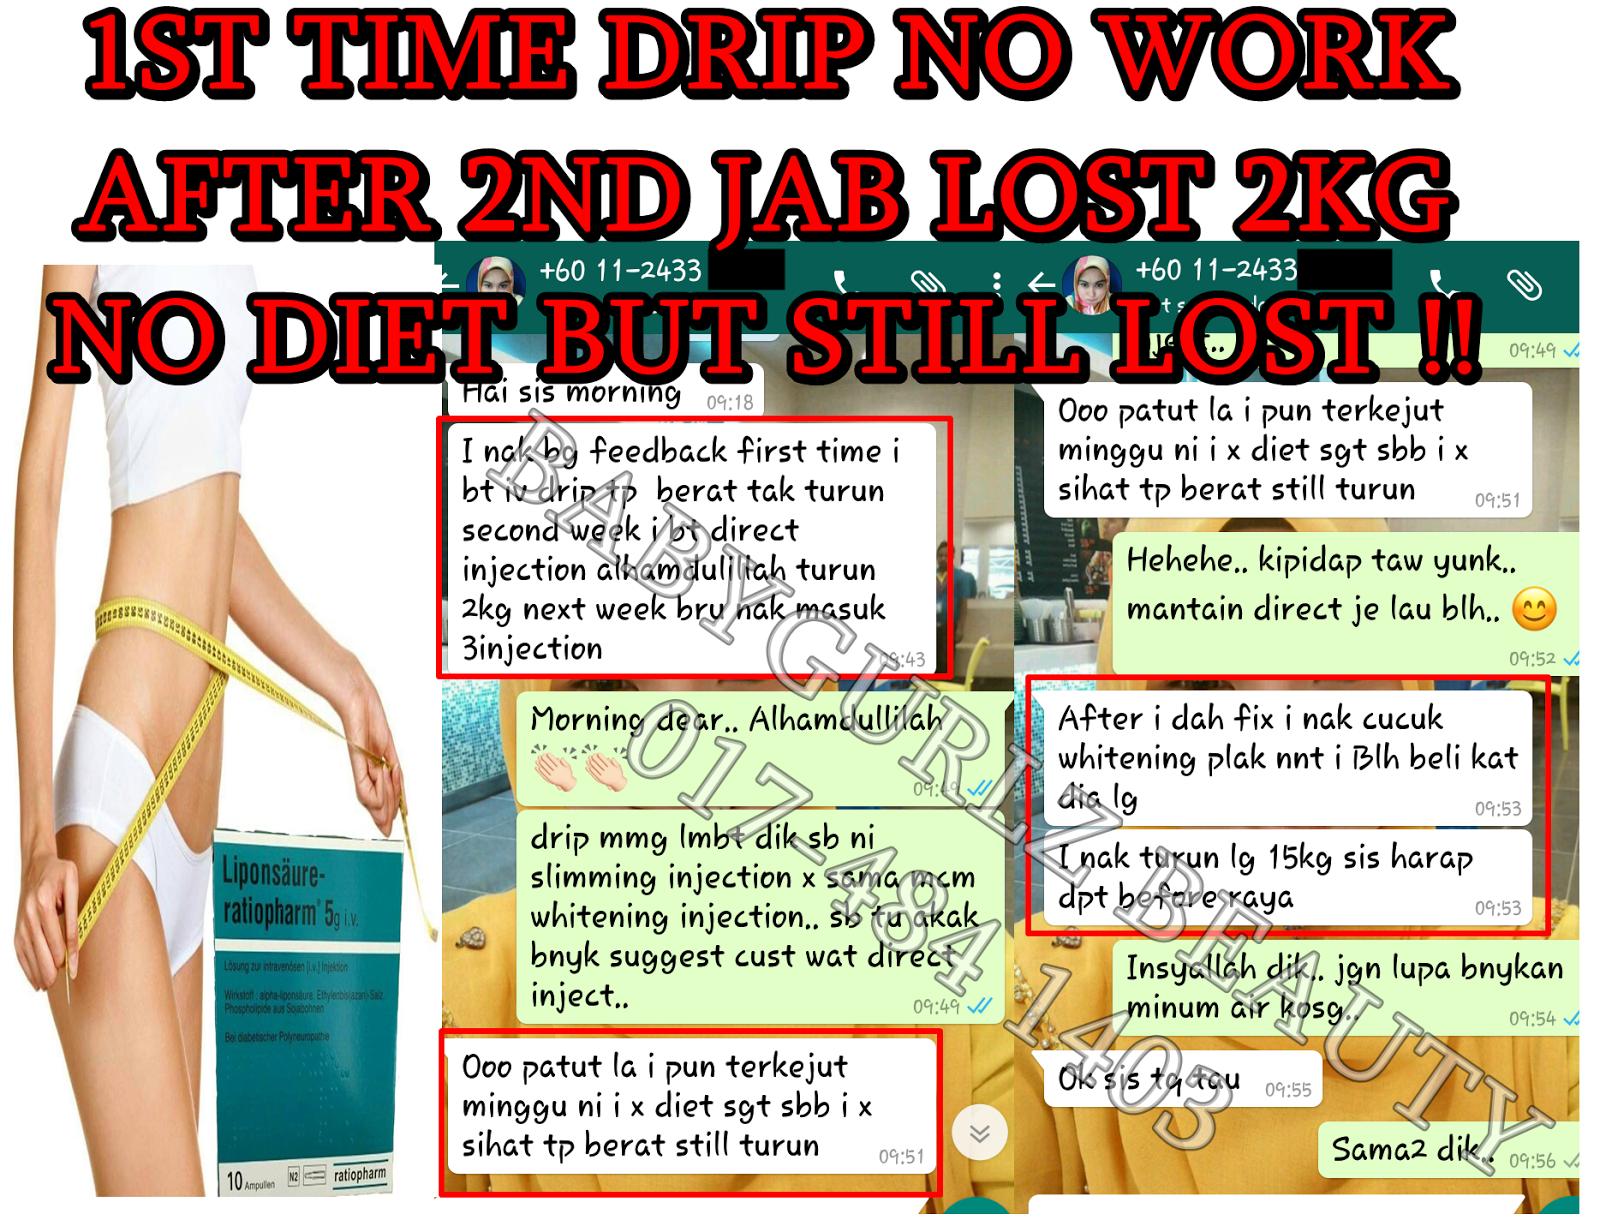 Diet pills ap suppressant fat burner water pill - Herbal